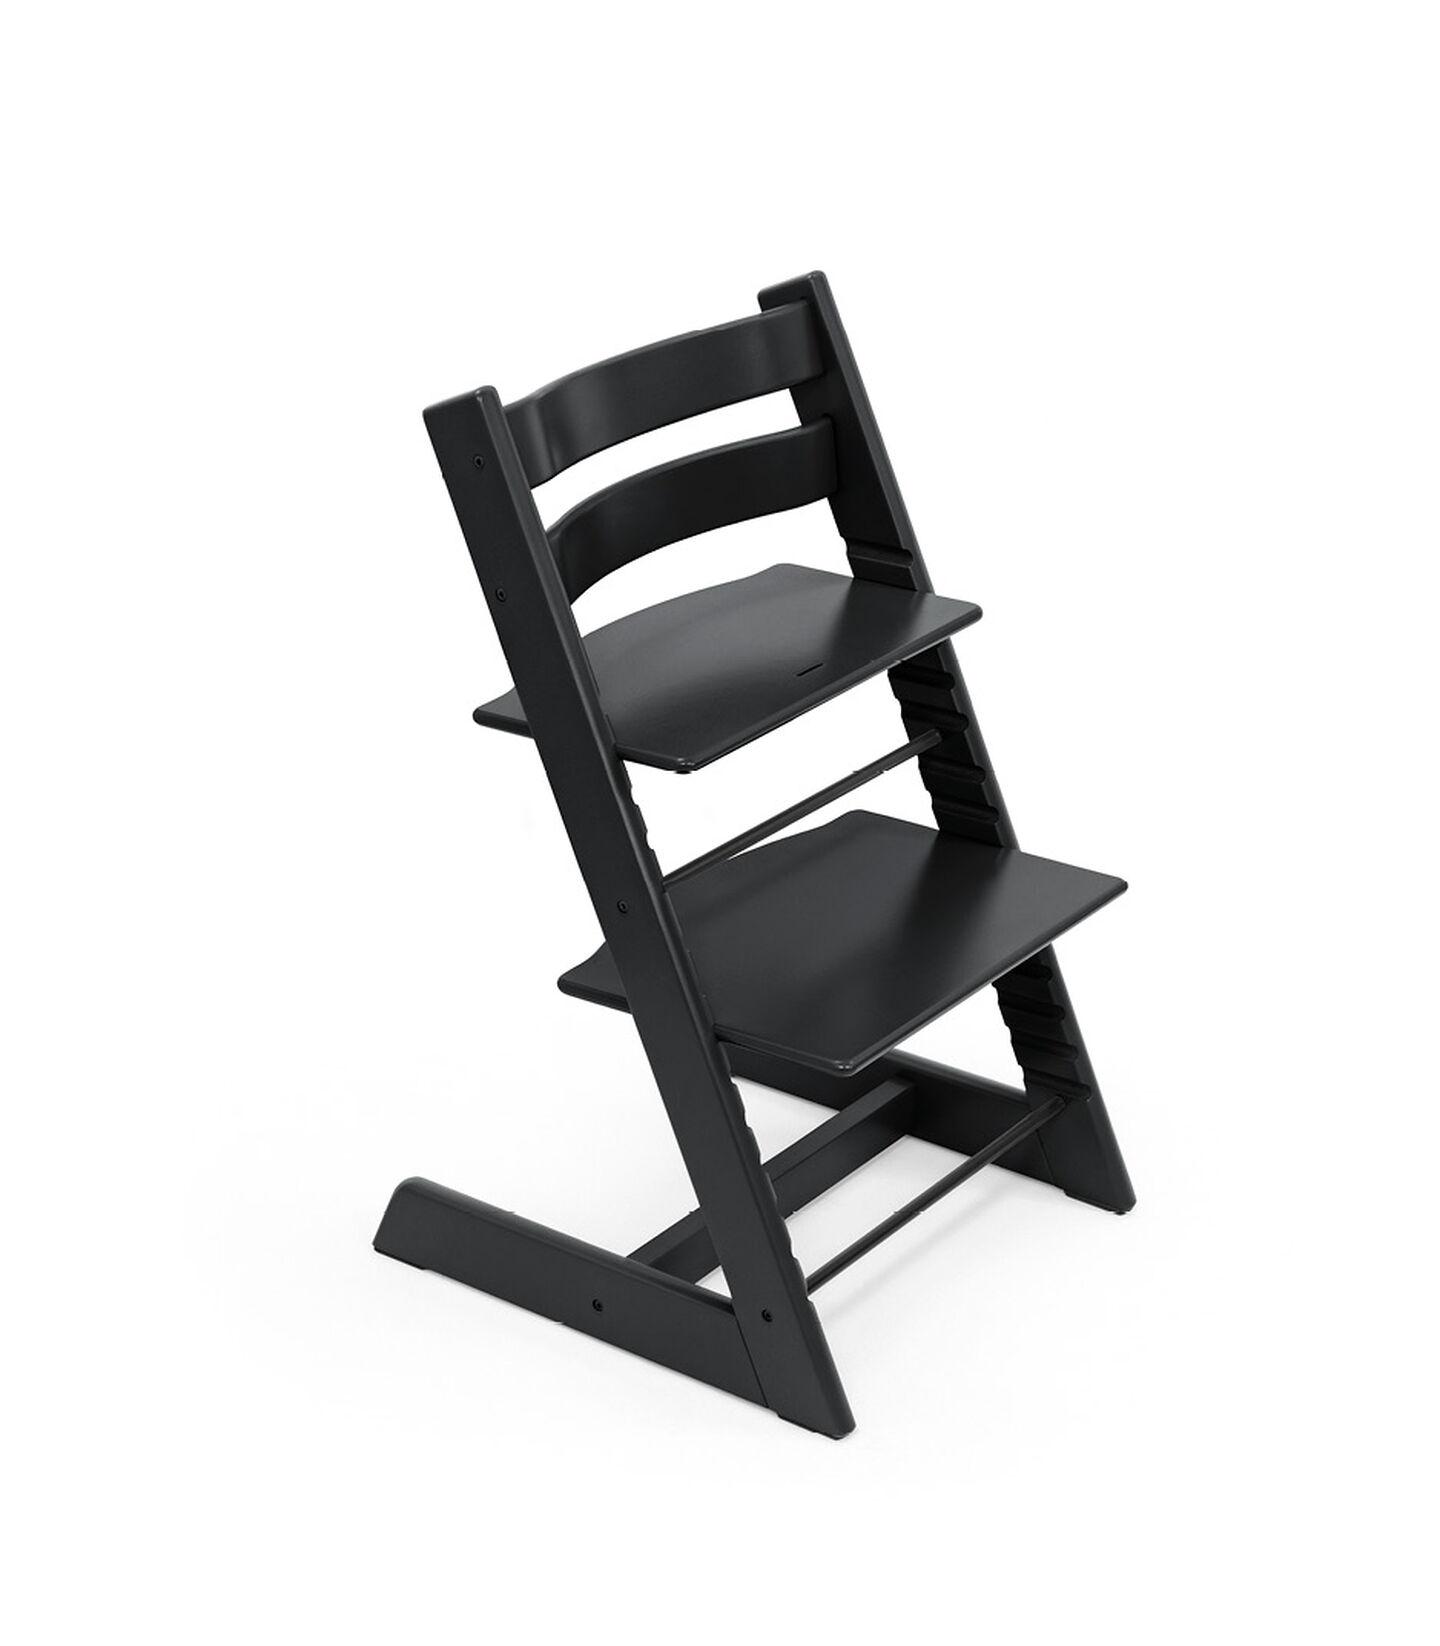 Tripp Trapp® Stuhl Black, Black, mainview view 1